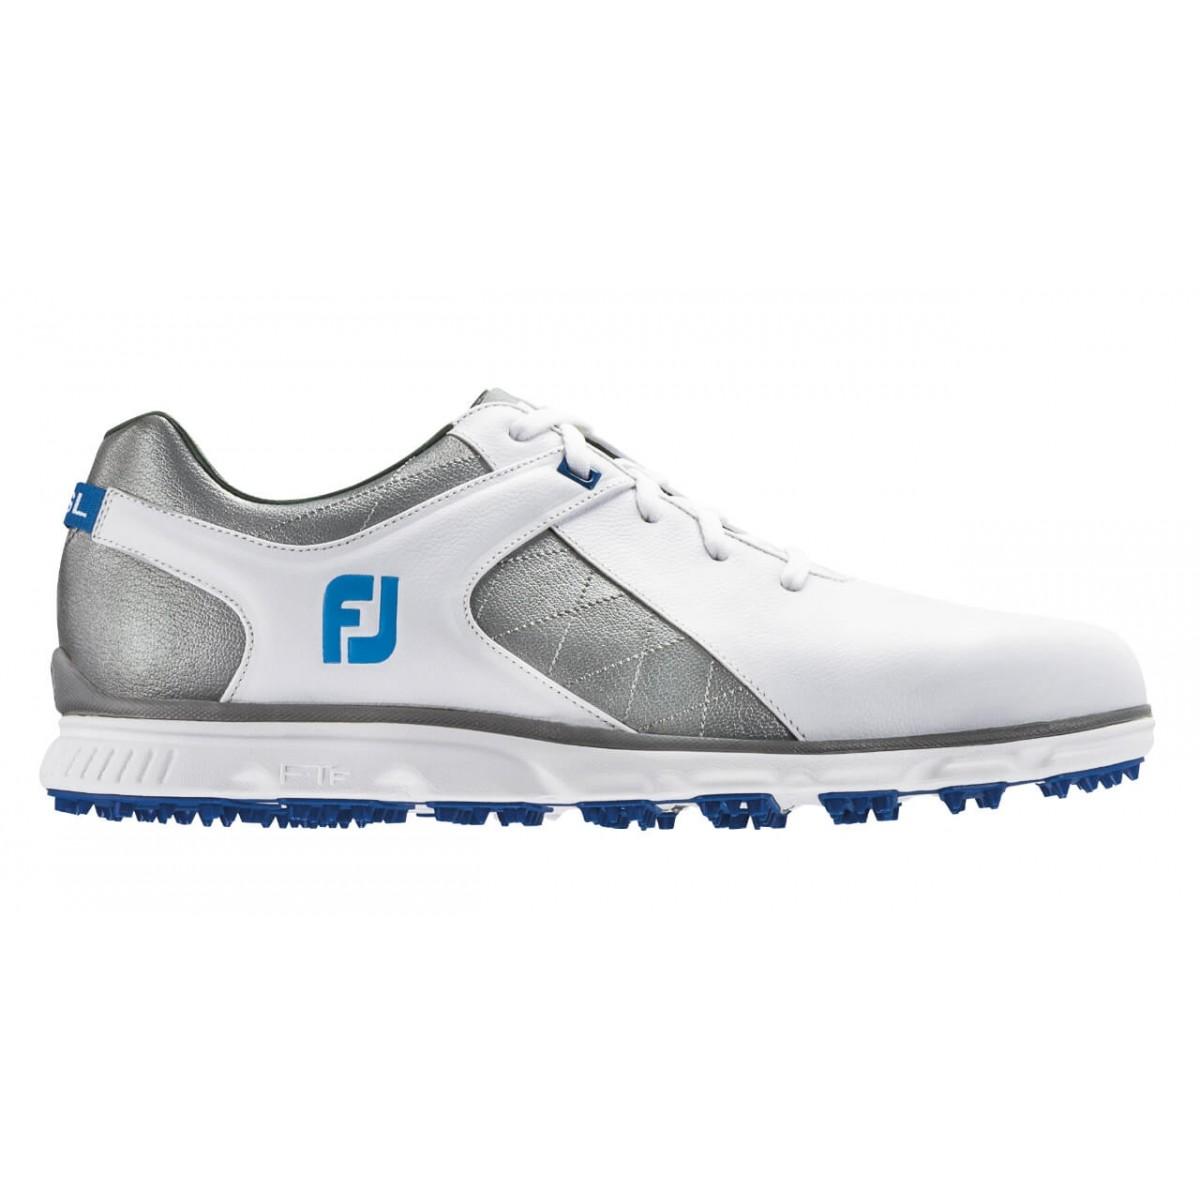 FootJoy Pro SL Spikeless White/Grey/Light Blue Golf Shoes - Previous Season #53266